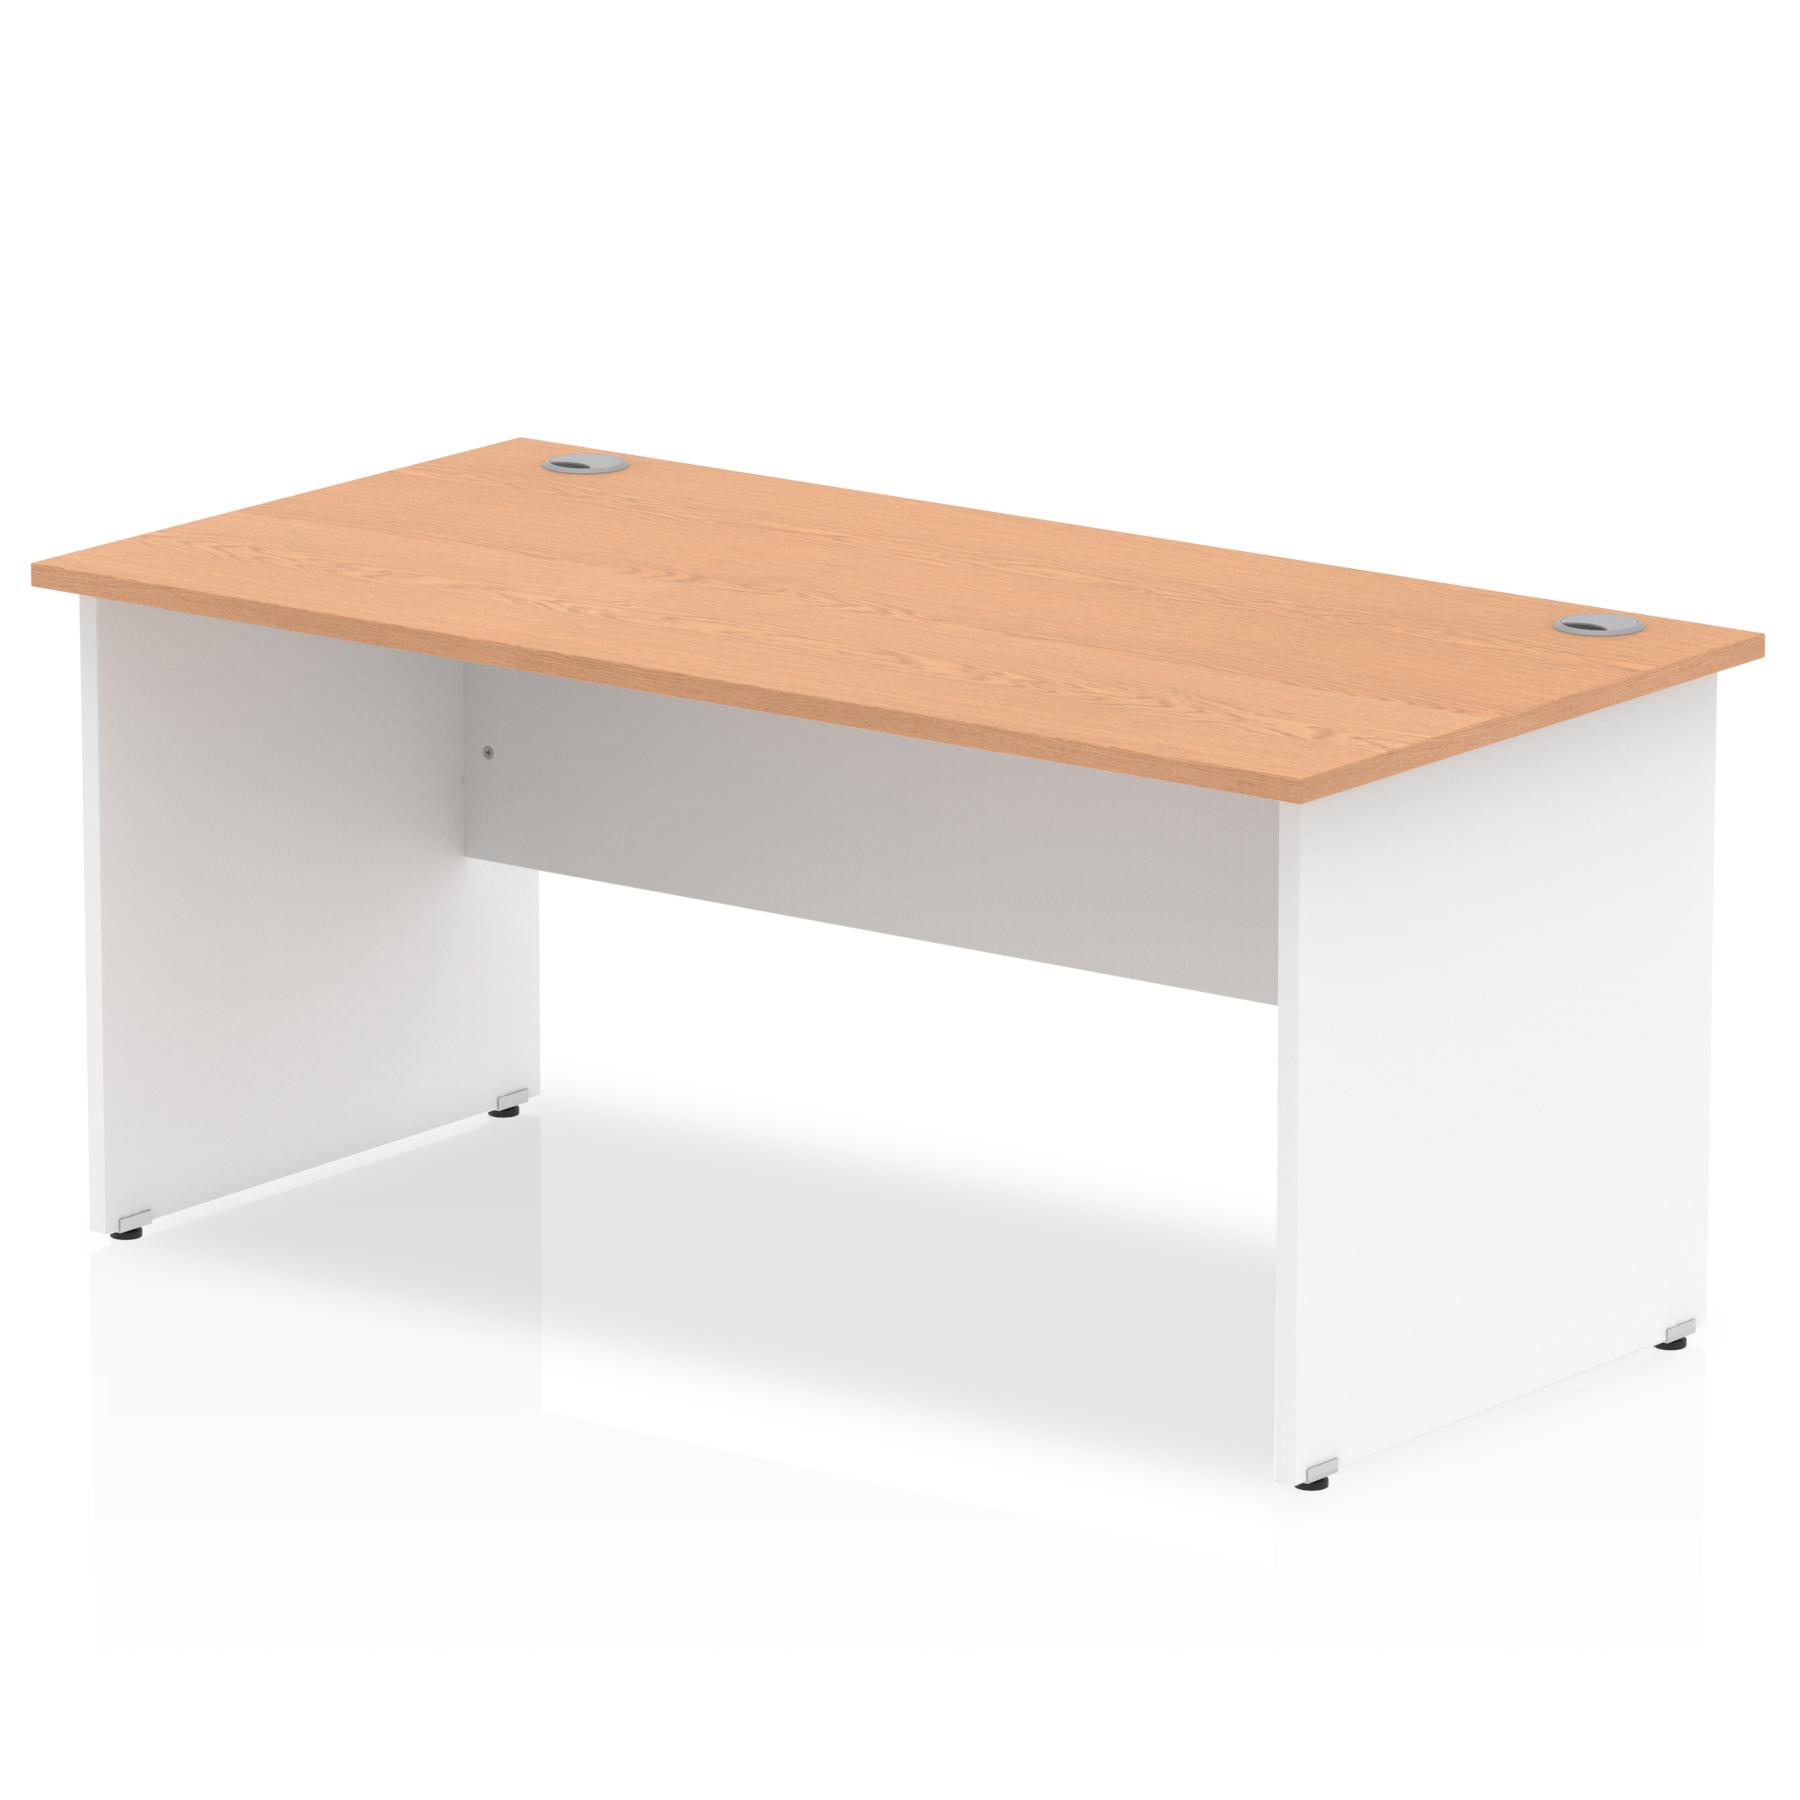 Trexus Desk Rectangle Panel End 1800x800mm Oak Top White Panels Ref TT000023